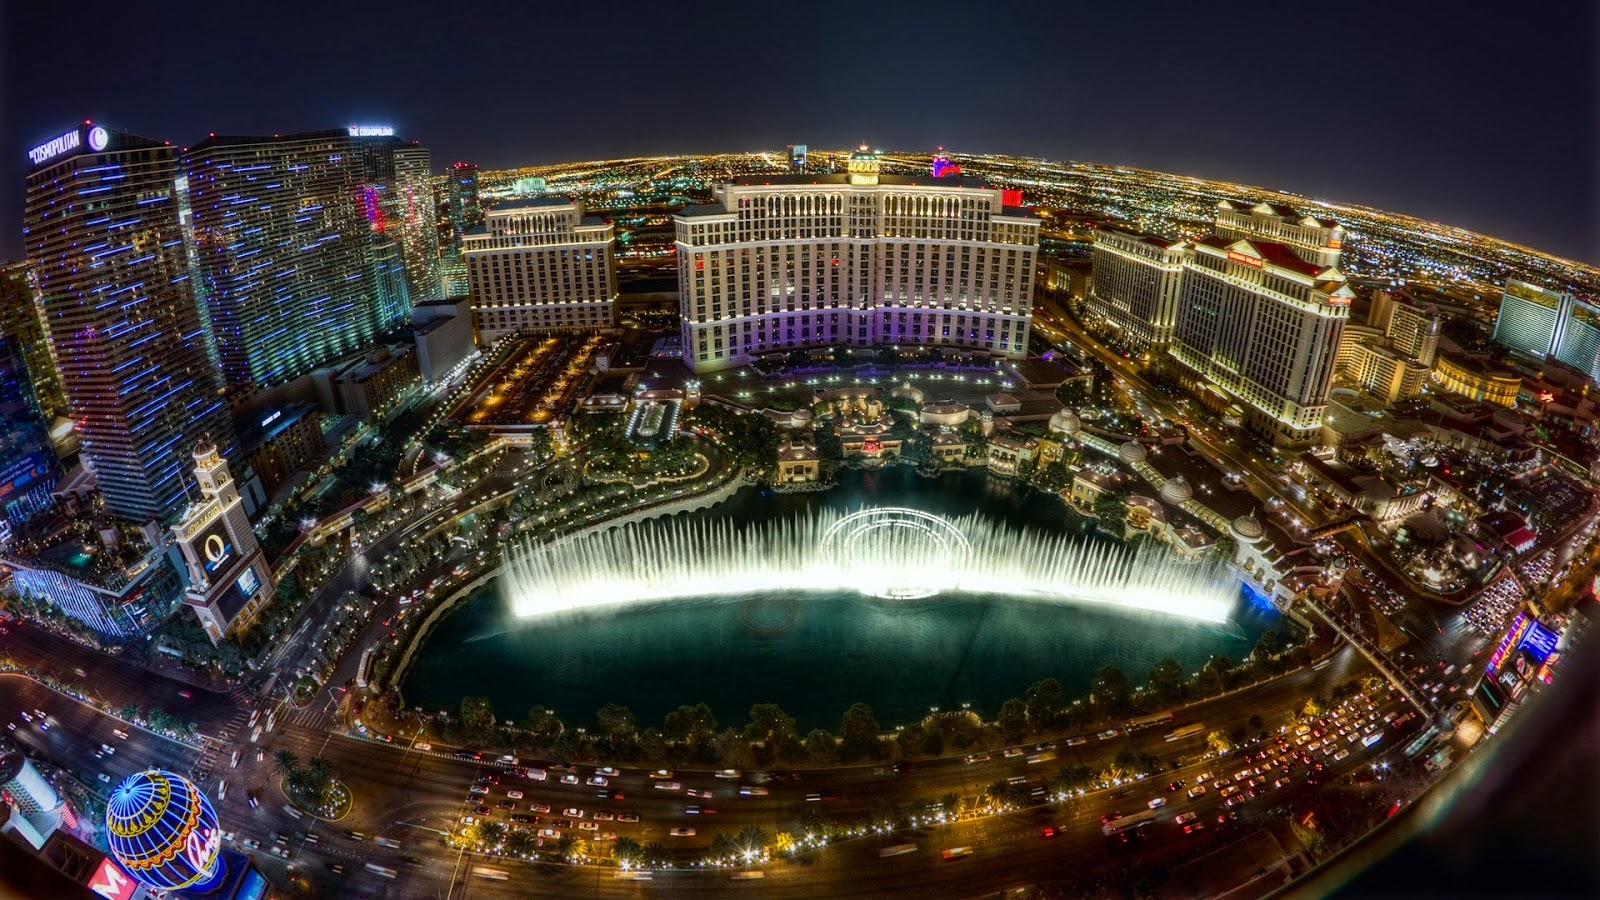 HD WALLPAPERS: Download Las Vegas At Night HD Wallpapers 1080p